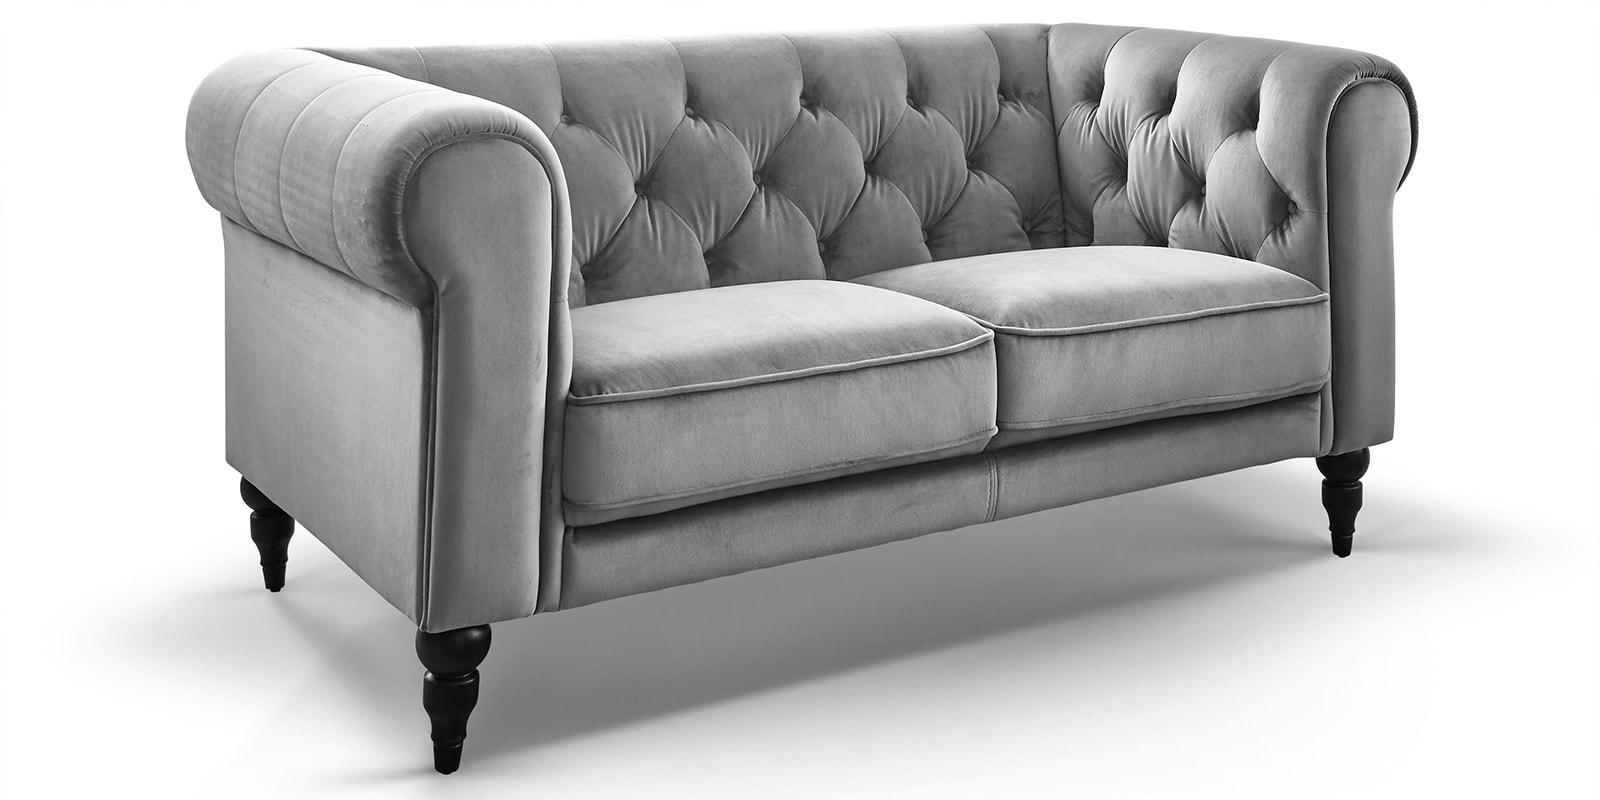 Full Size of Chesterfield Sofa Grau Couch Samt Set Leder Graue Stoff Otto 2 Sitzer 2er Hudson Kinderzimmer Großes Indomo Xxxl Günstig Kaufen Boxspring Mega Mit Sofa Chesterfield Sofa Grau